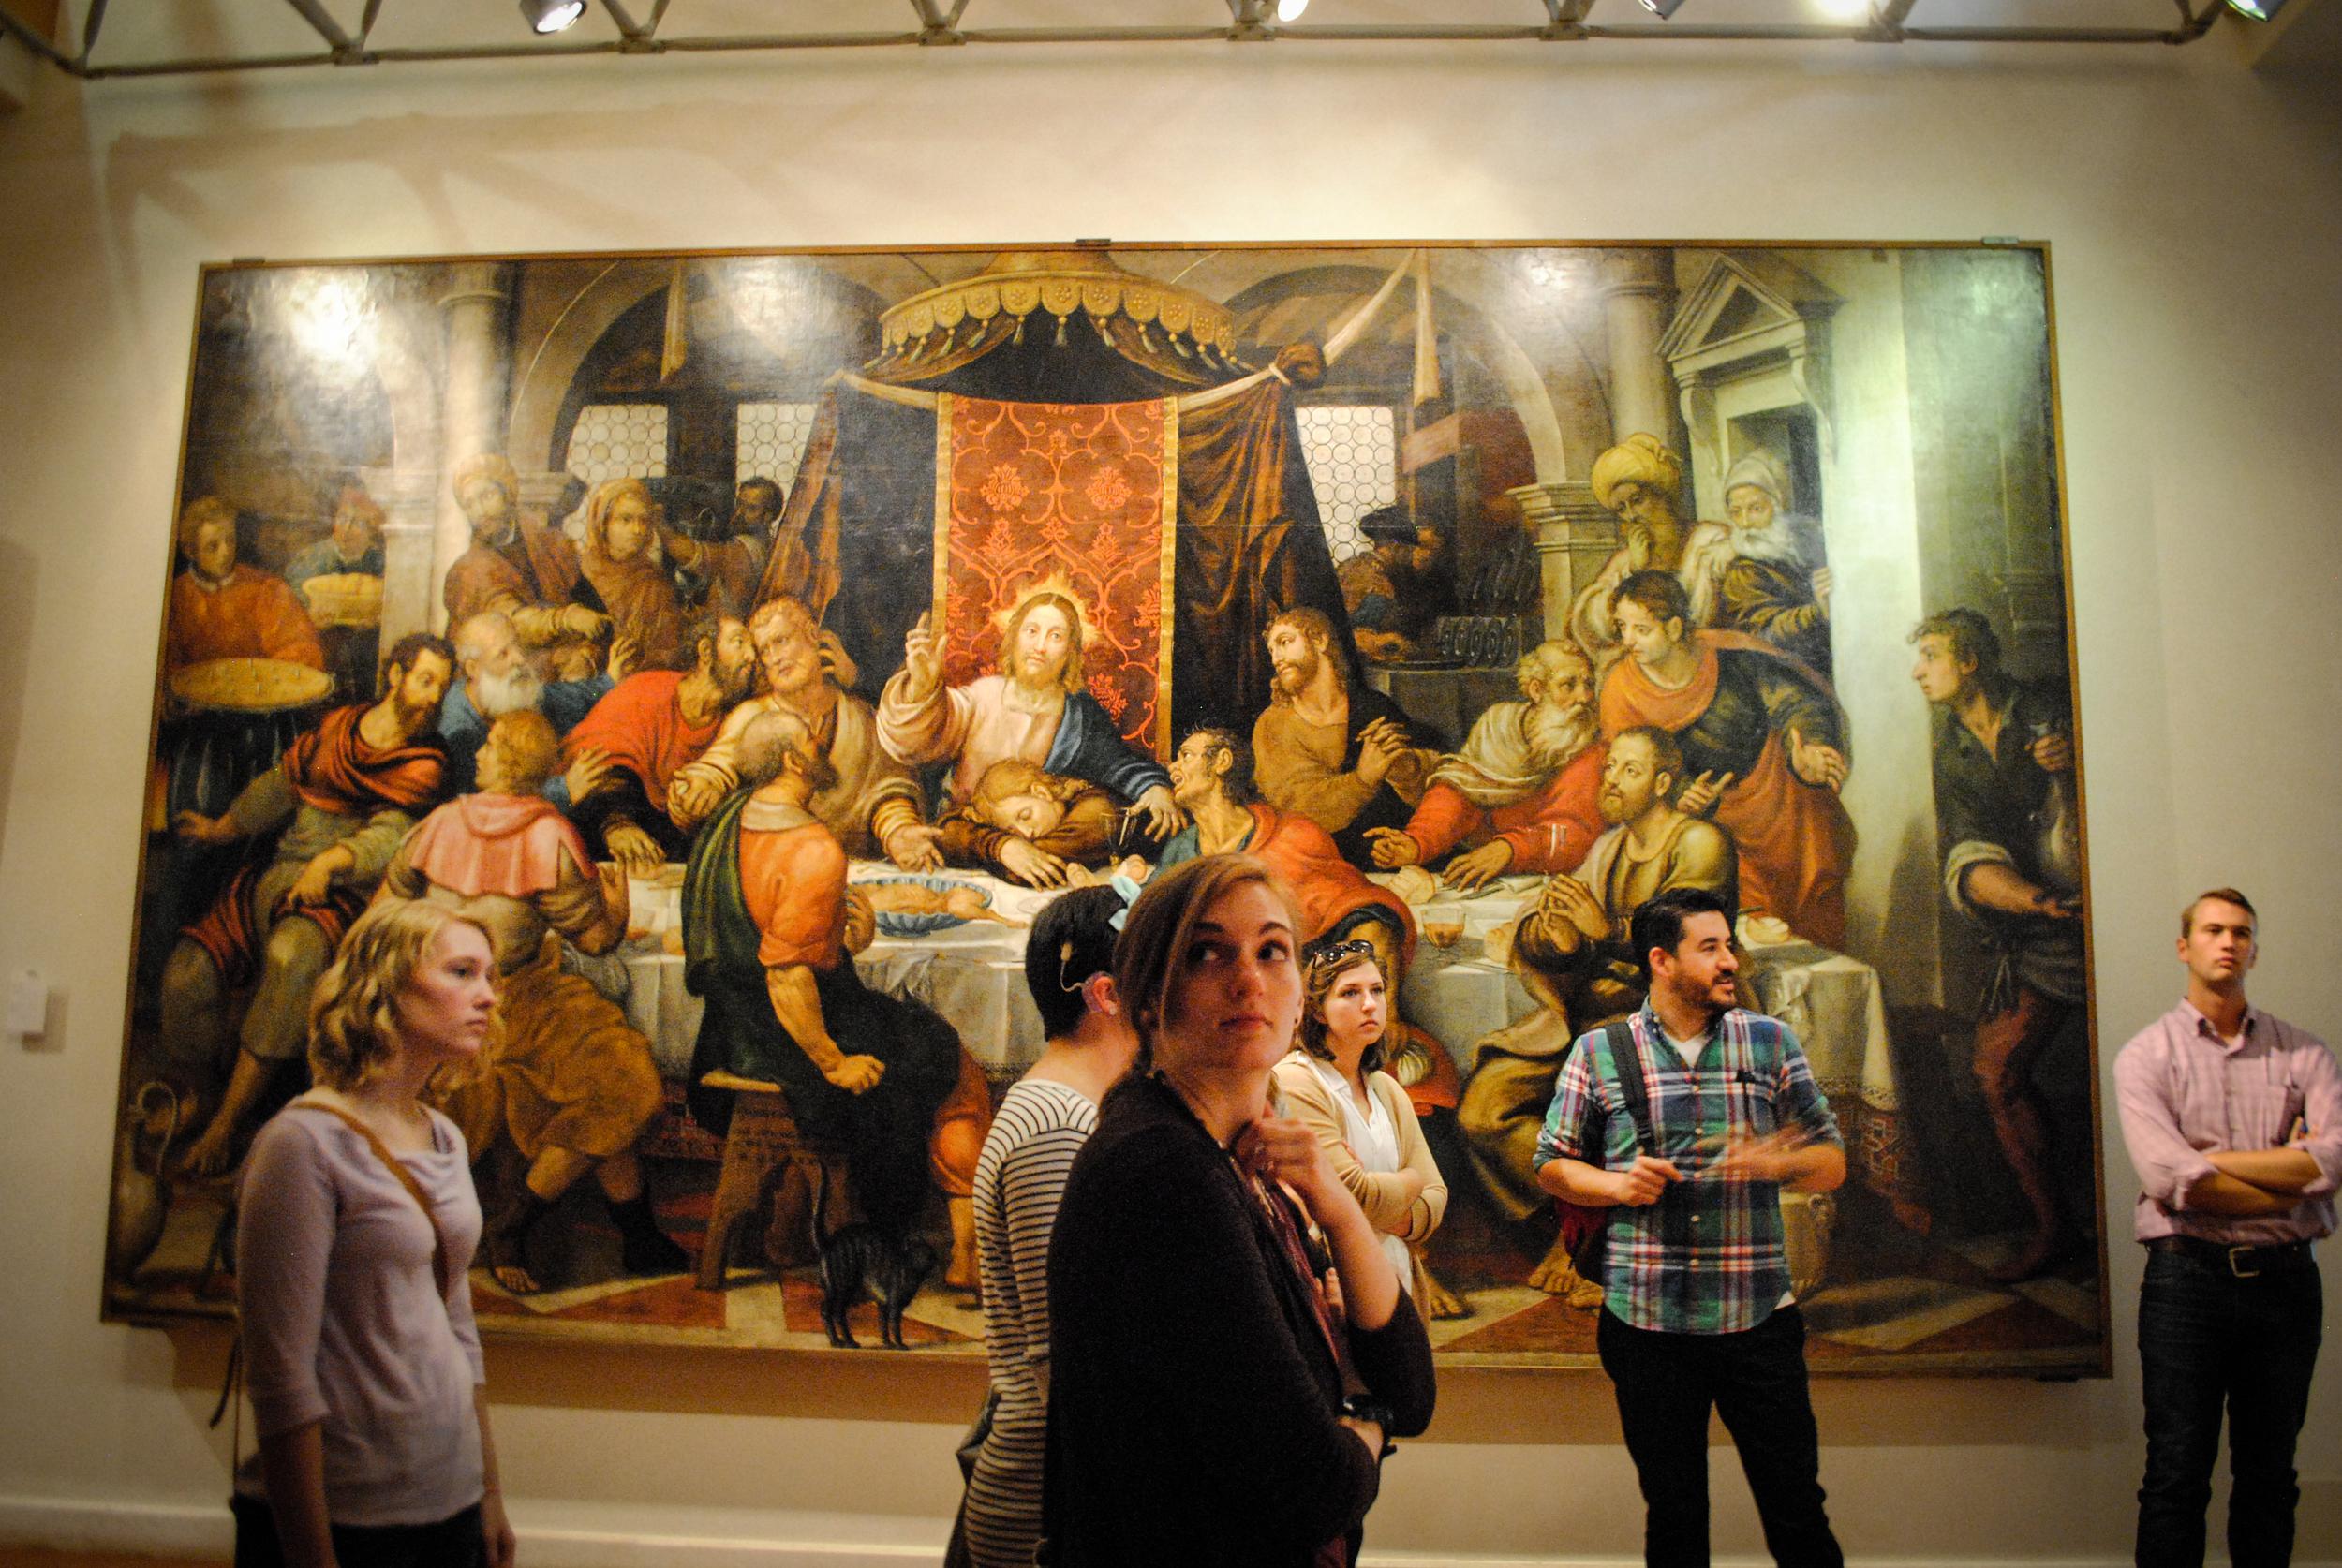 Friuli Museum, Udine